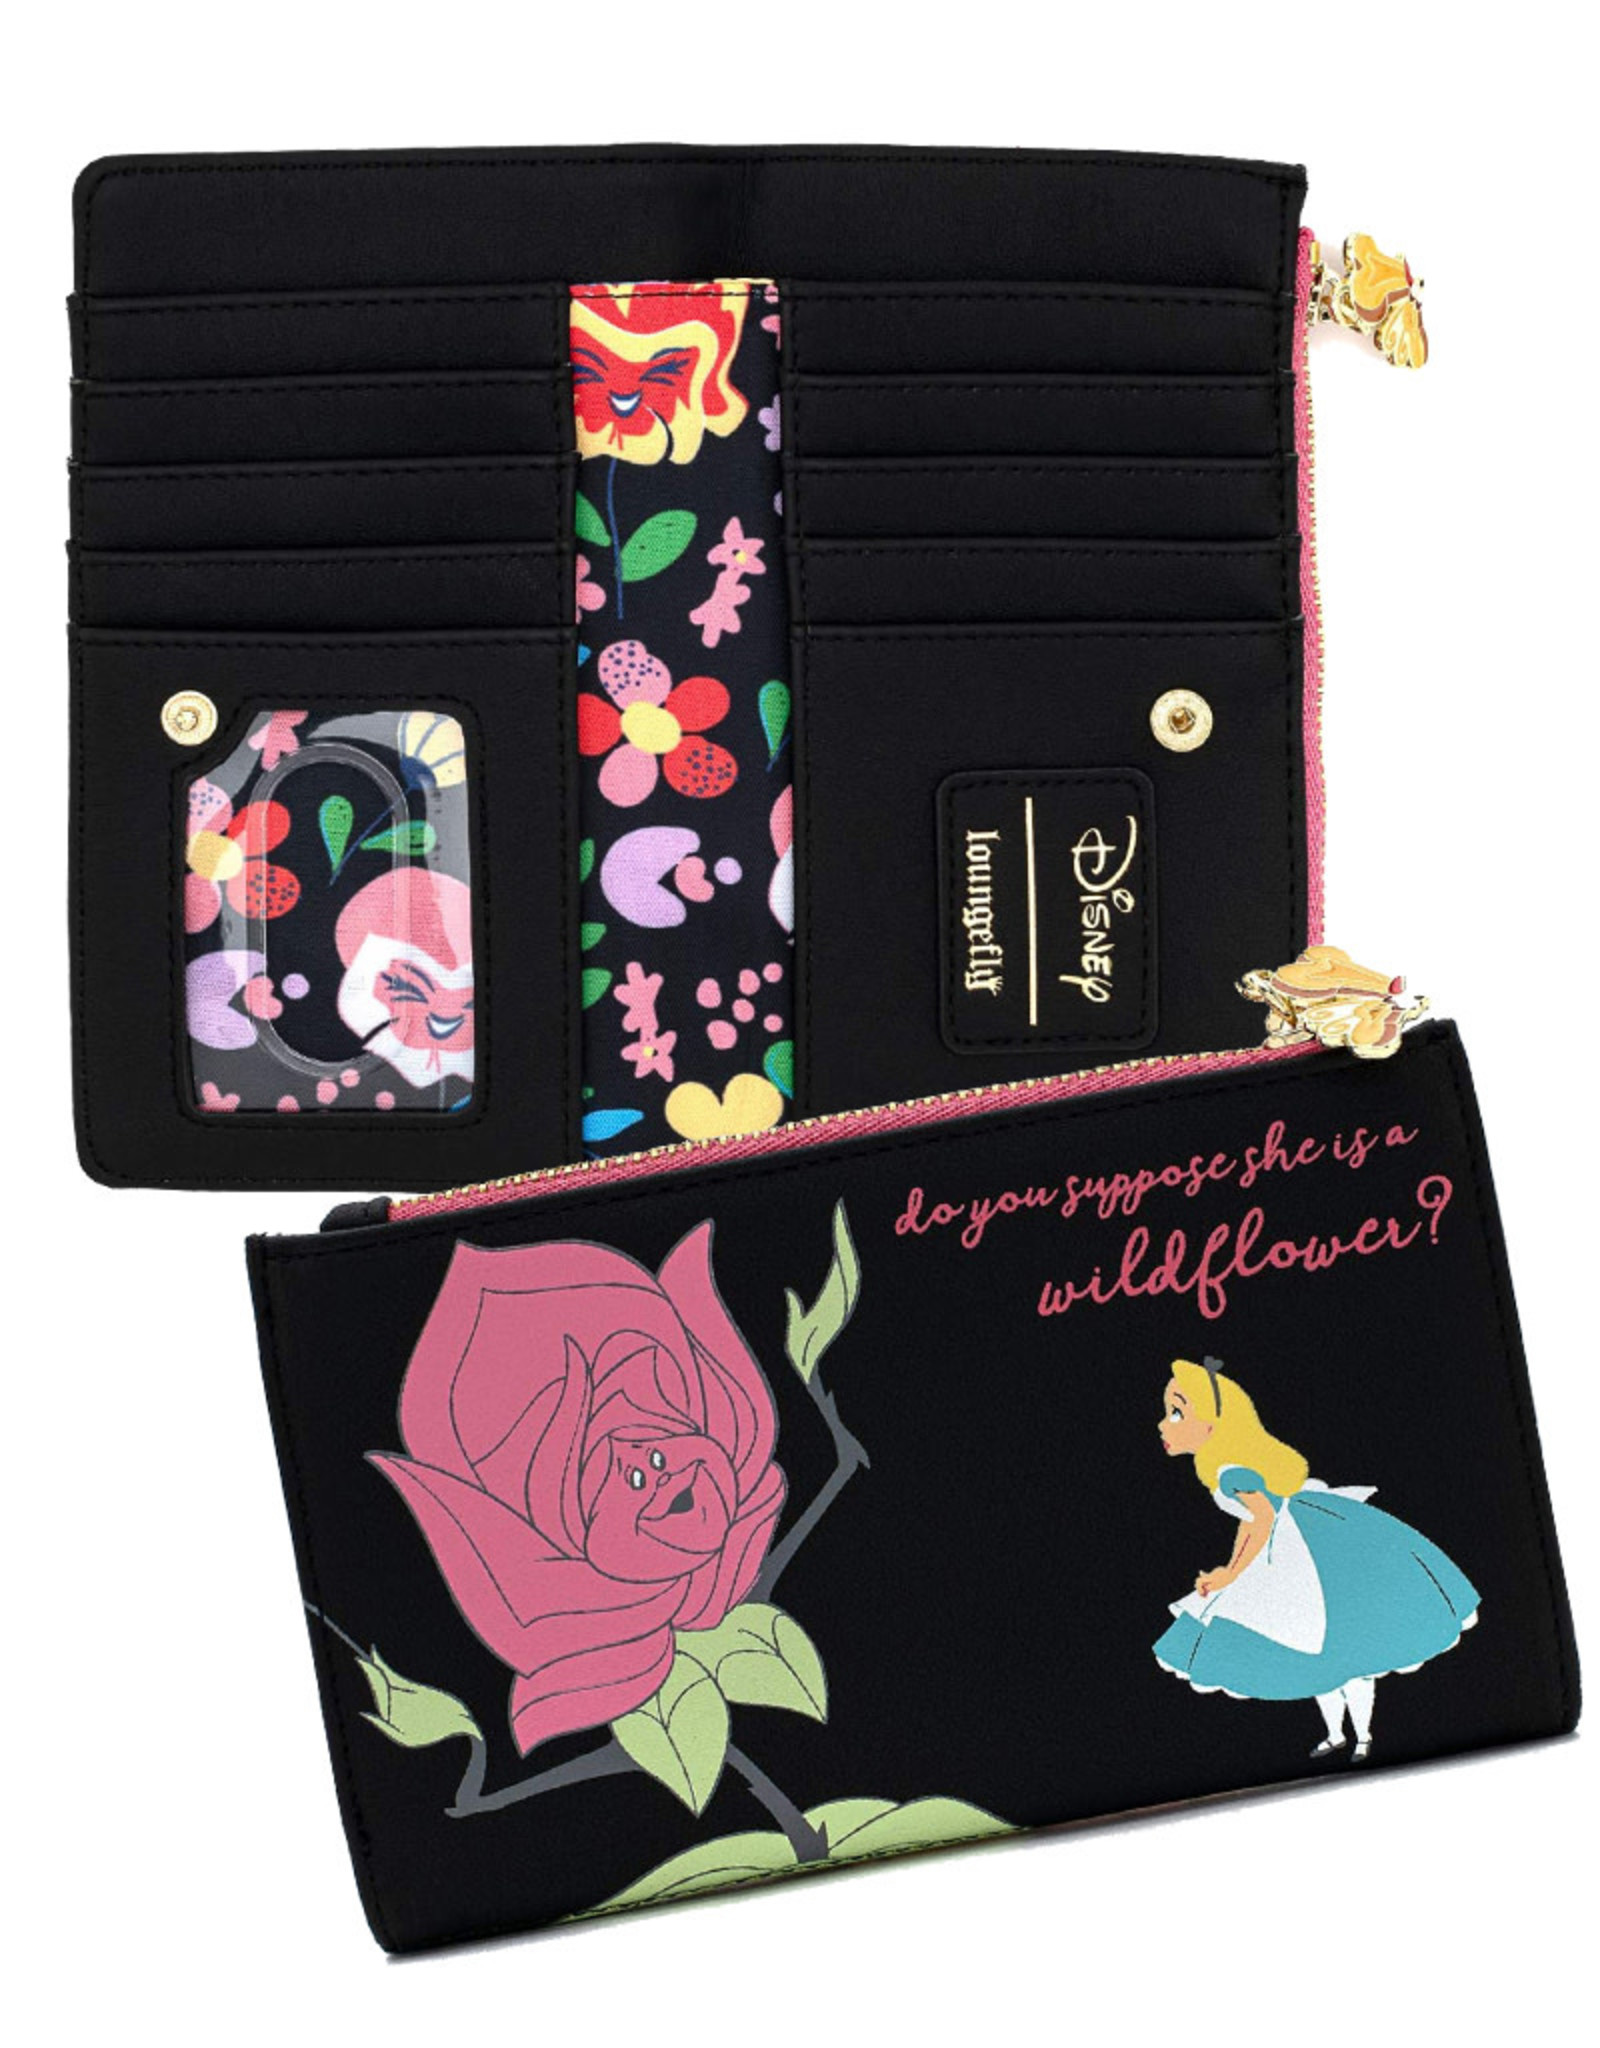 Disney Disney ( Loungefly Wallet  ) Alice